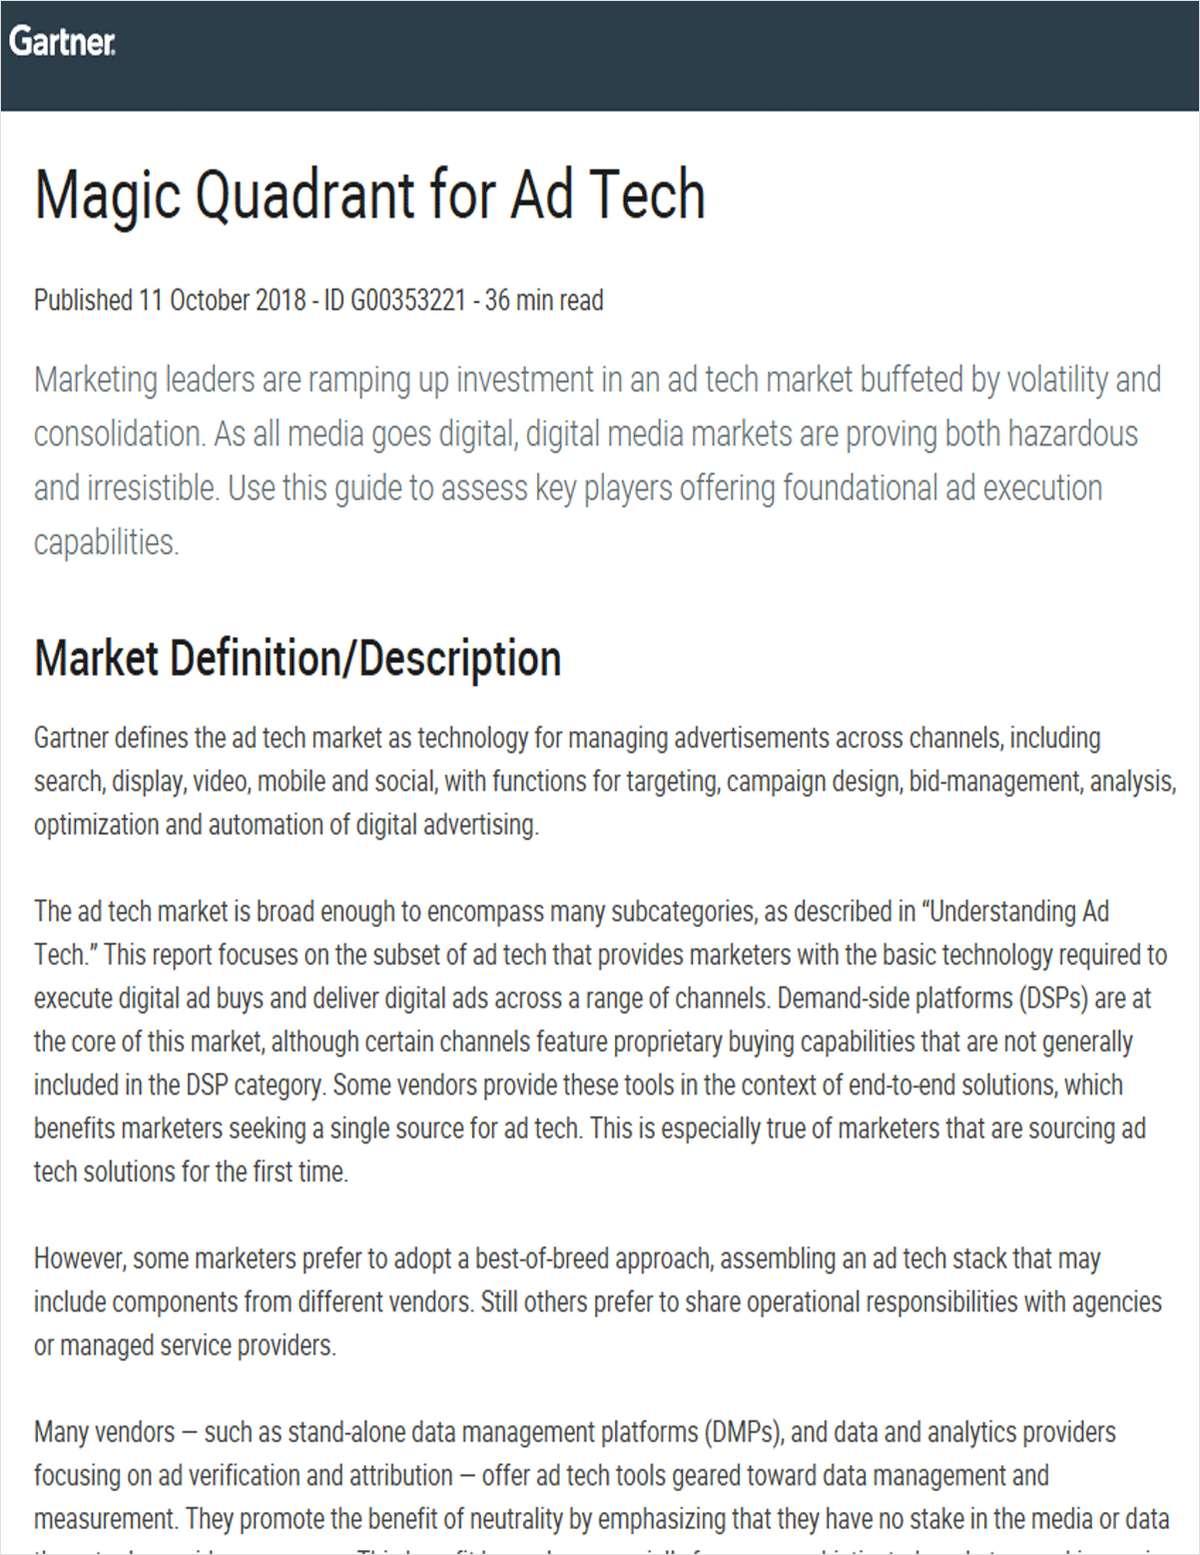 Magic Quadrant for Ad Tech